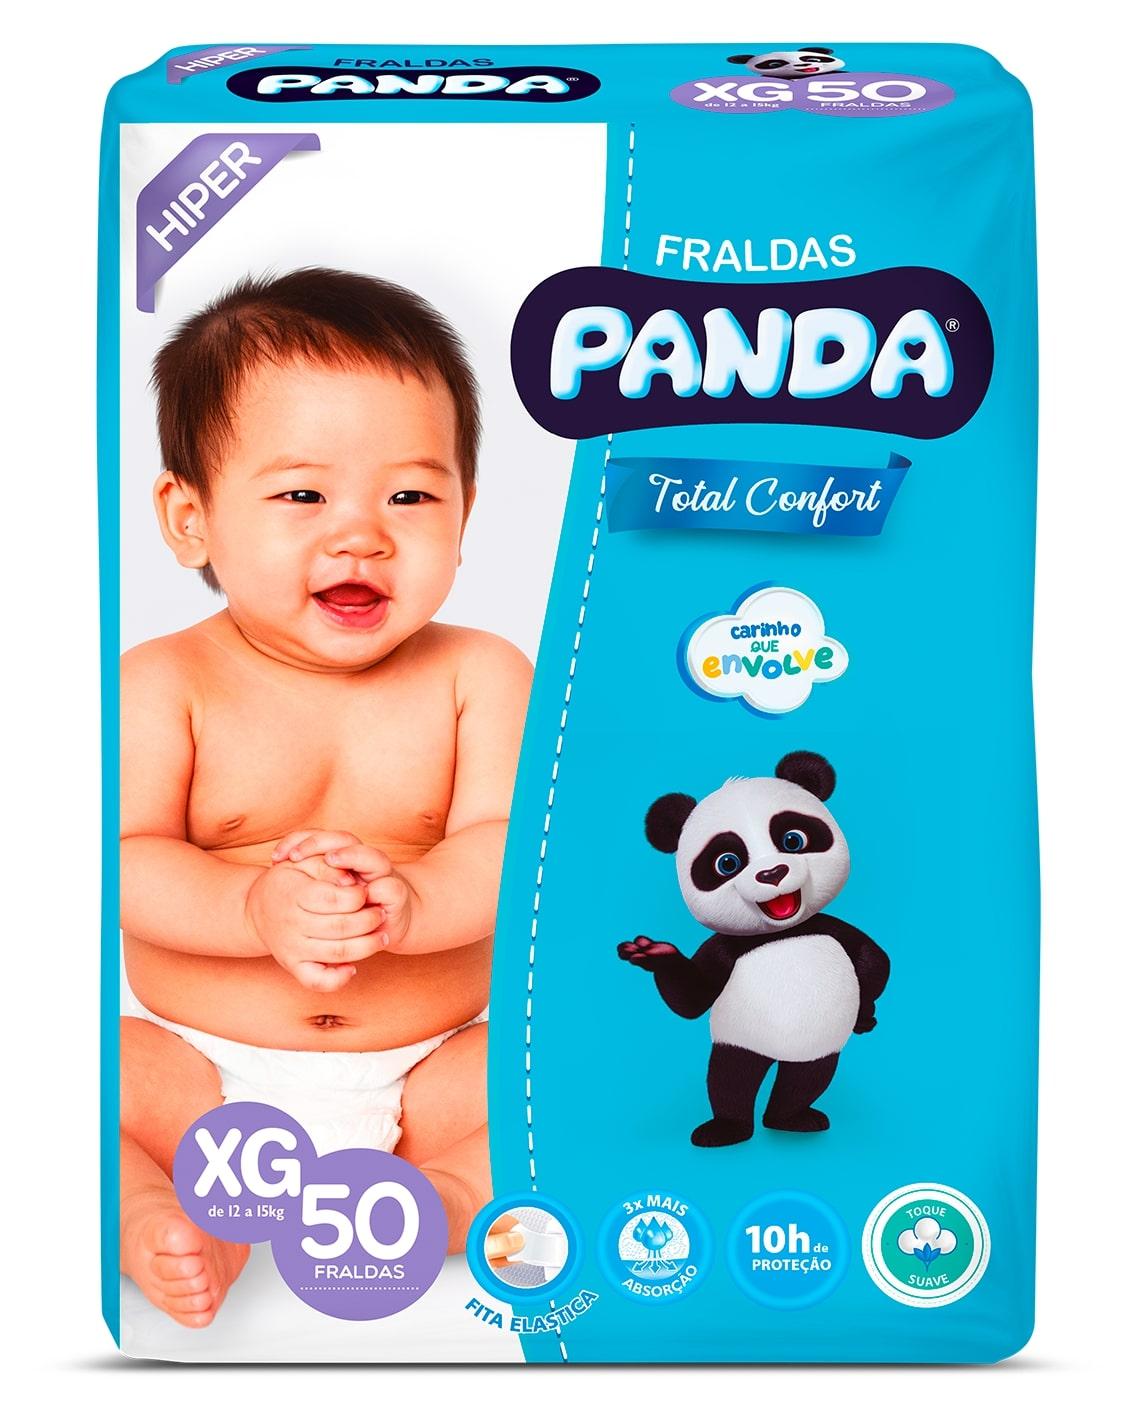 FRALDA PANDA T MACIO HIPER XG 50UN